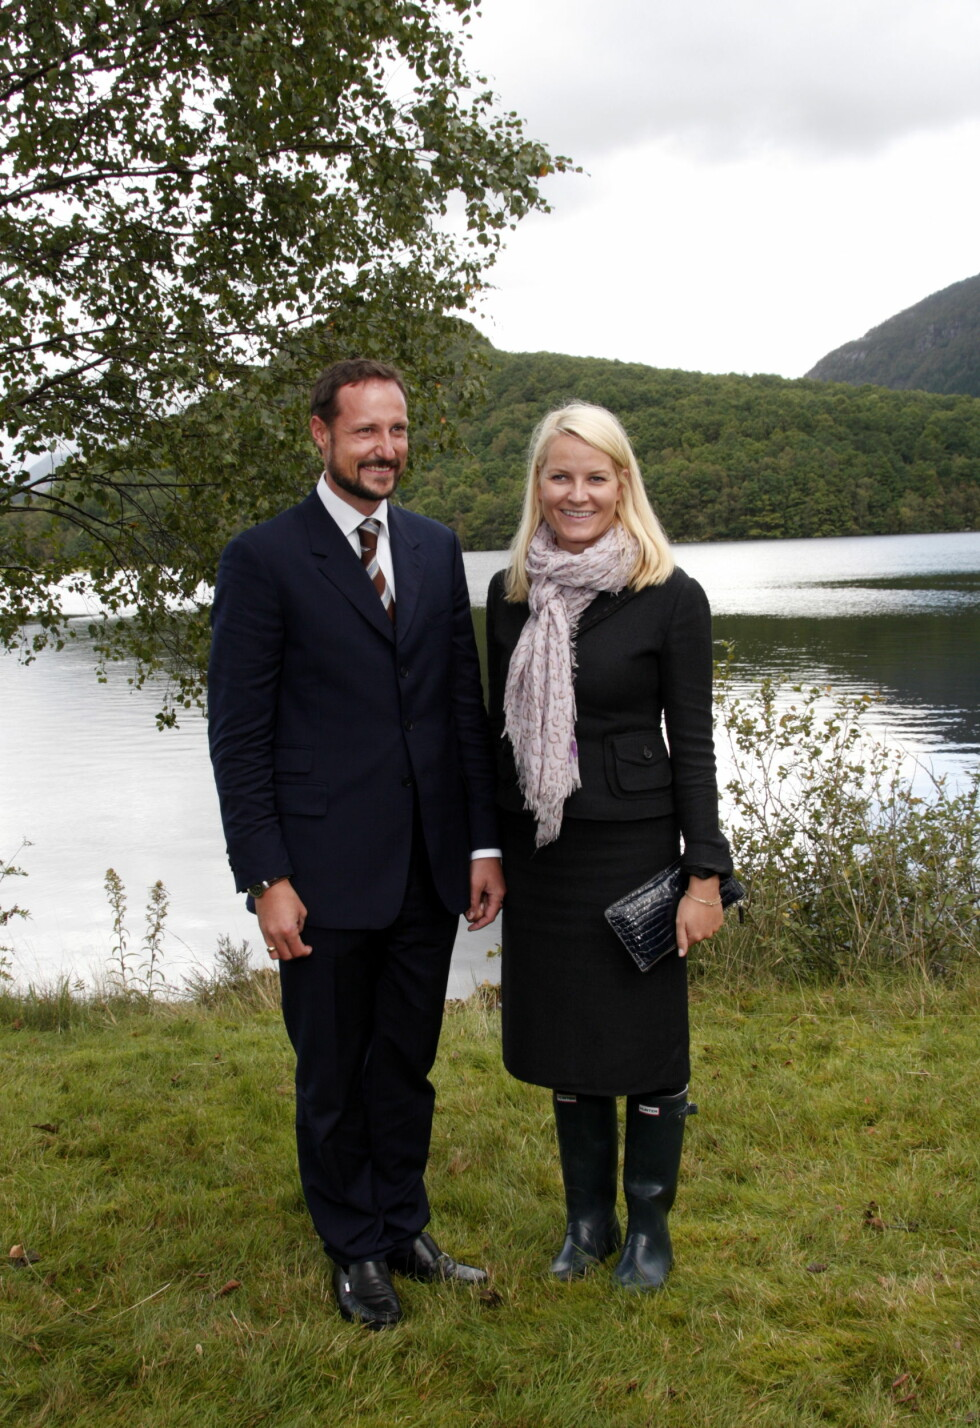 2009: Kronprinsparet på fylkesbesøk i Rogaland. Foto: NTB scanpix